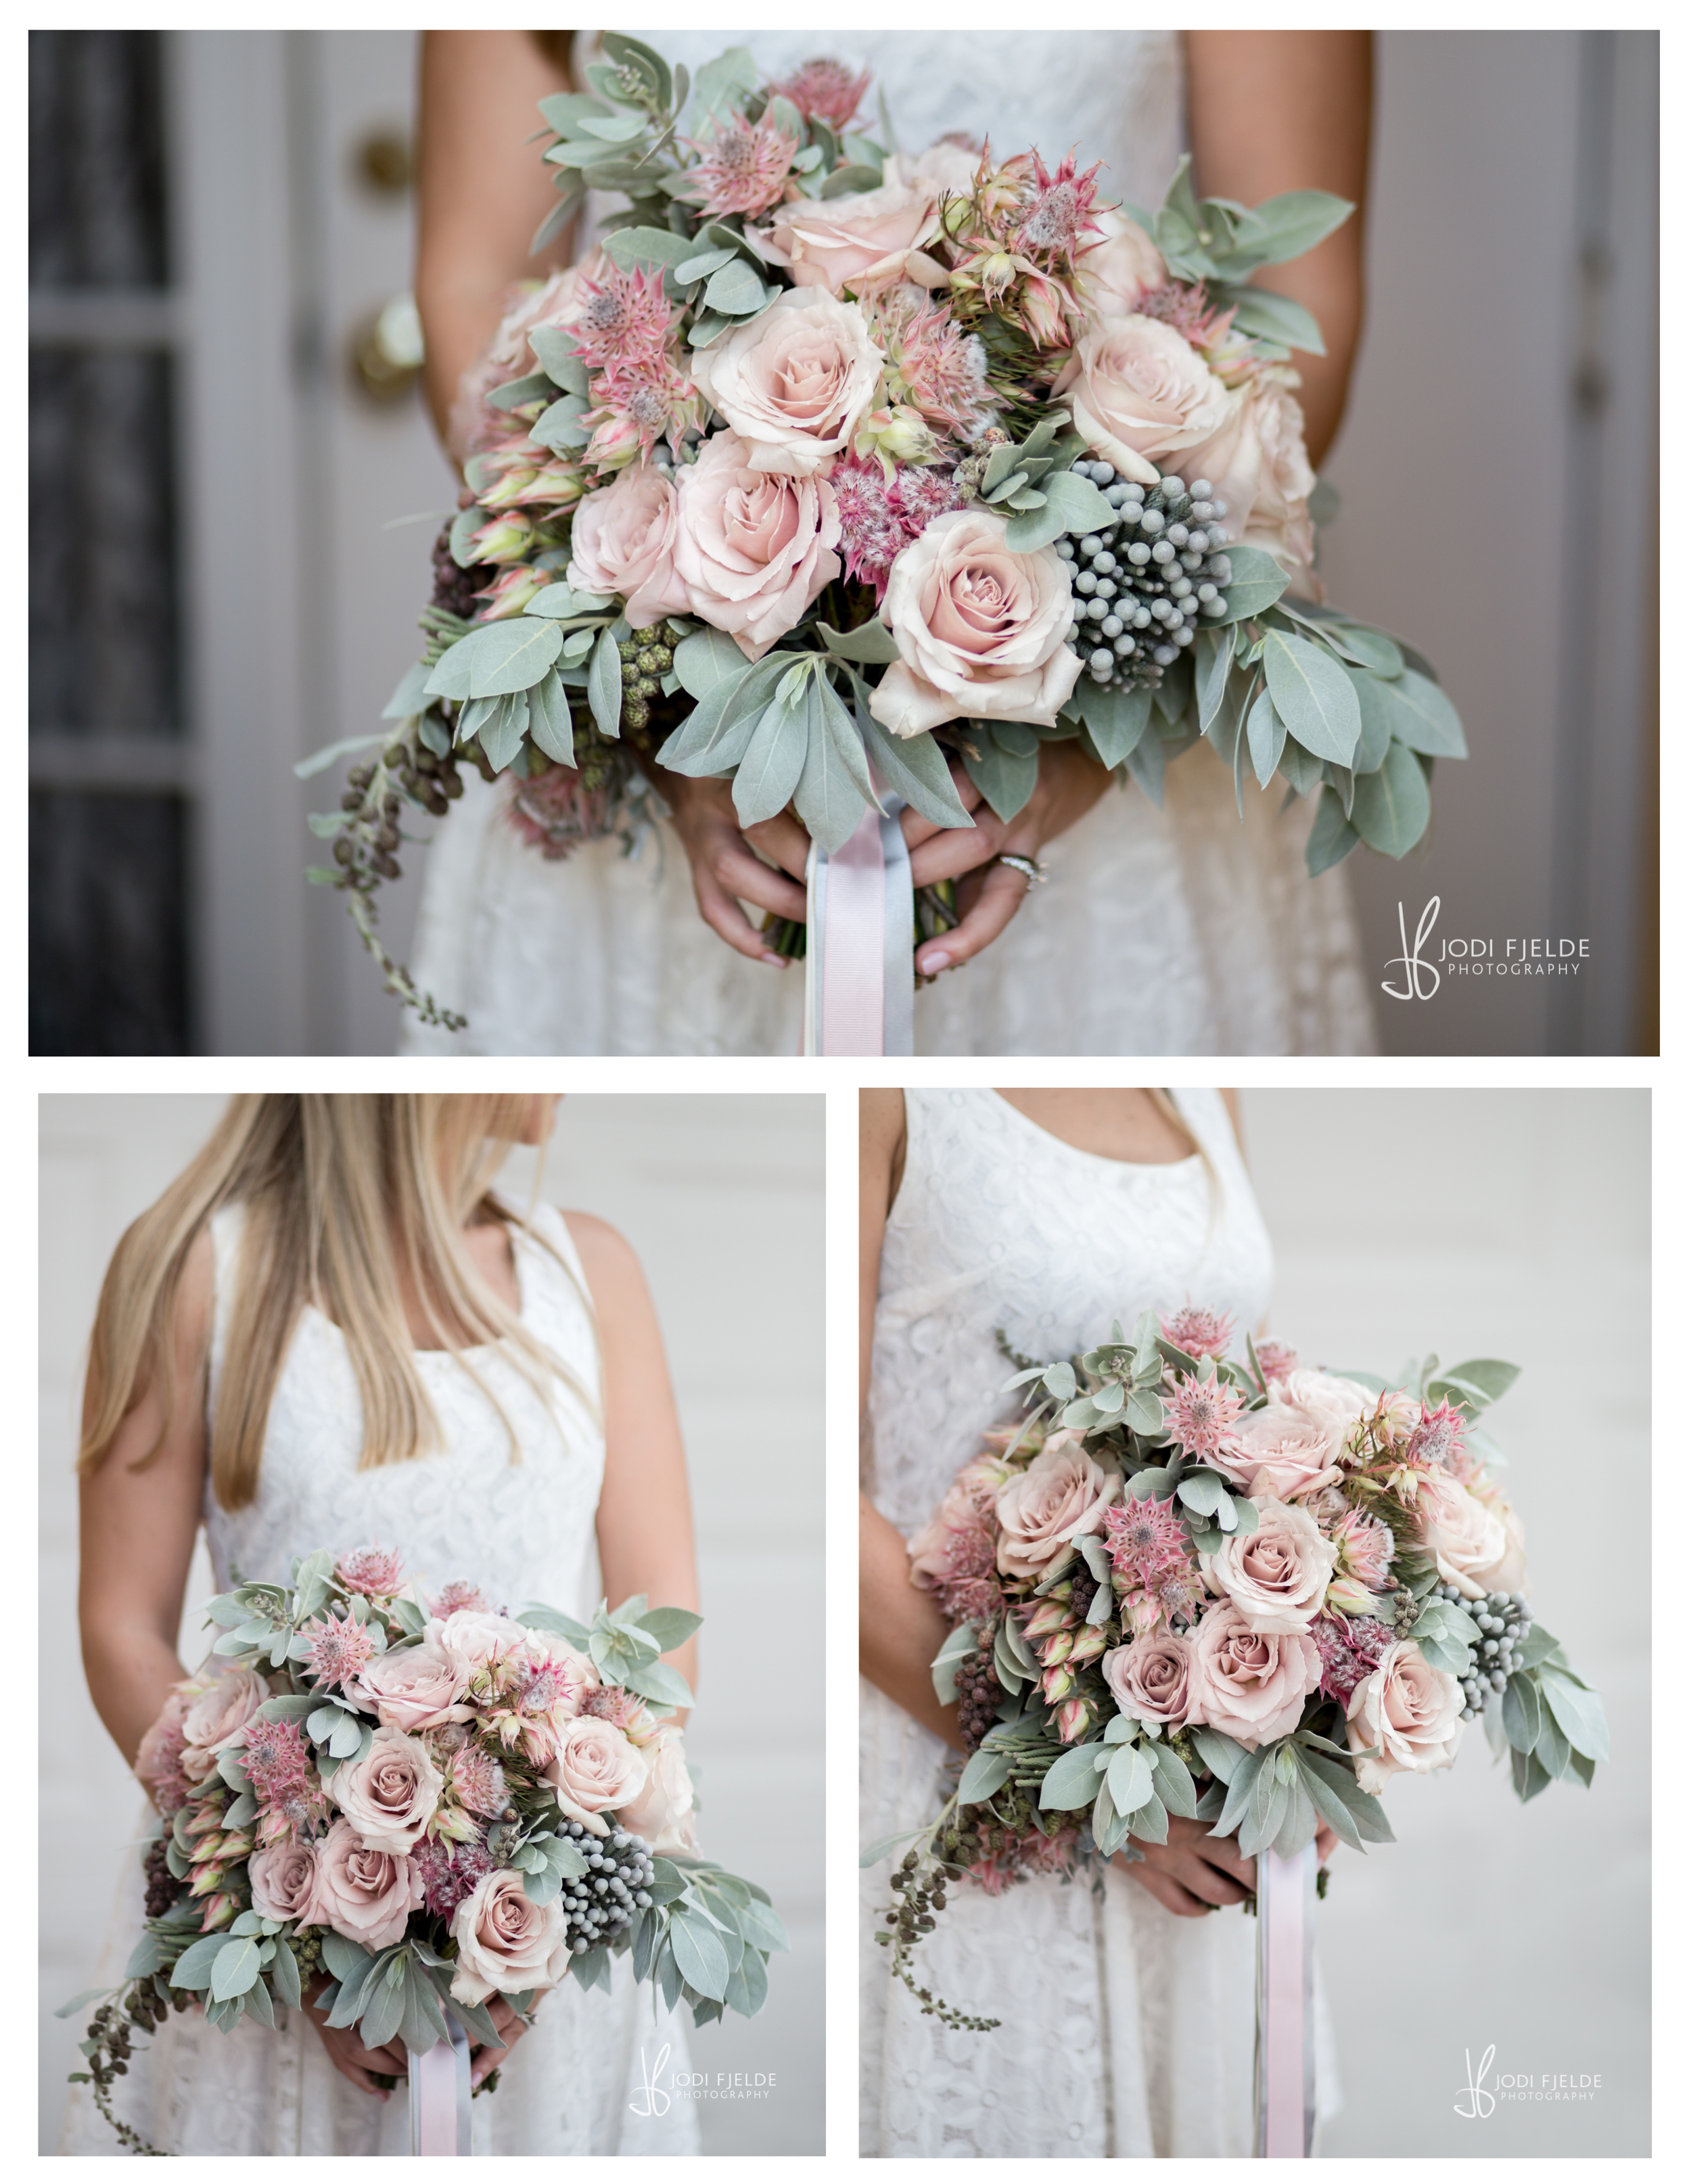 Parkland_Commercial_Business_Branding_Photography_Flowerly Studio_Jodi_Fjelde_Photogrpahy_10.jpg